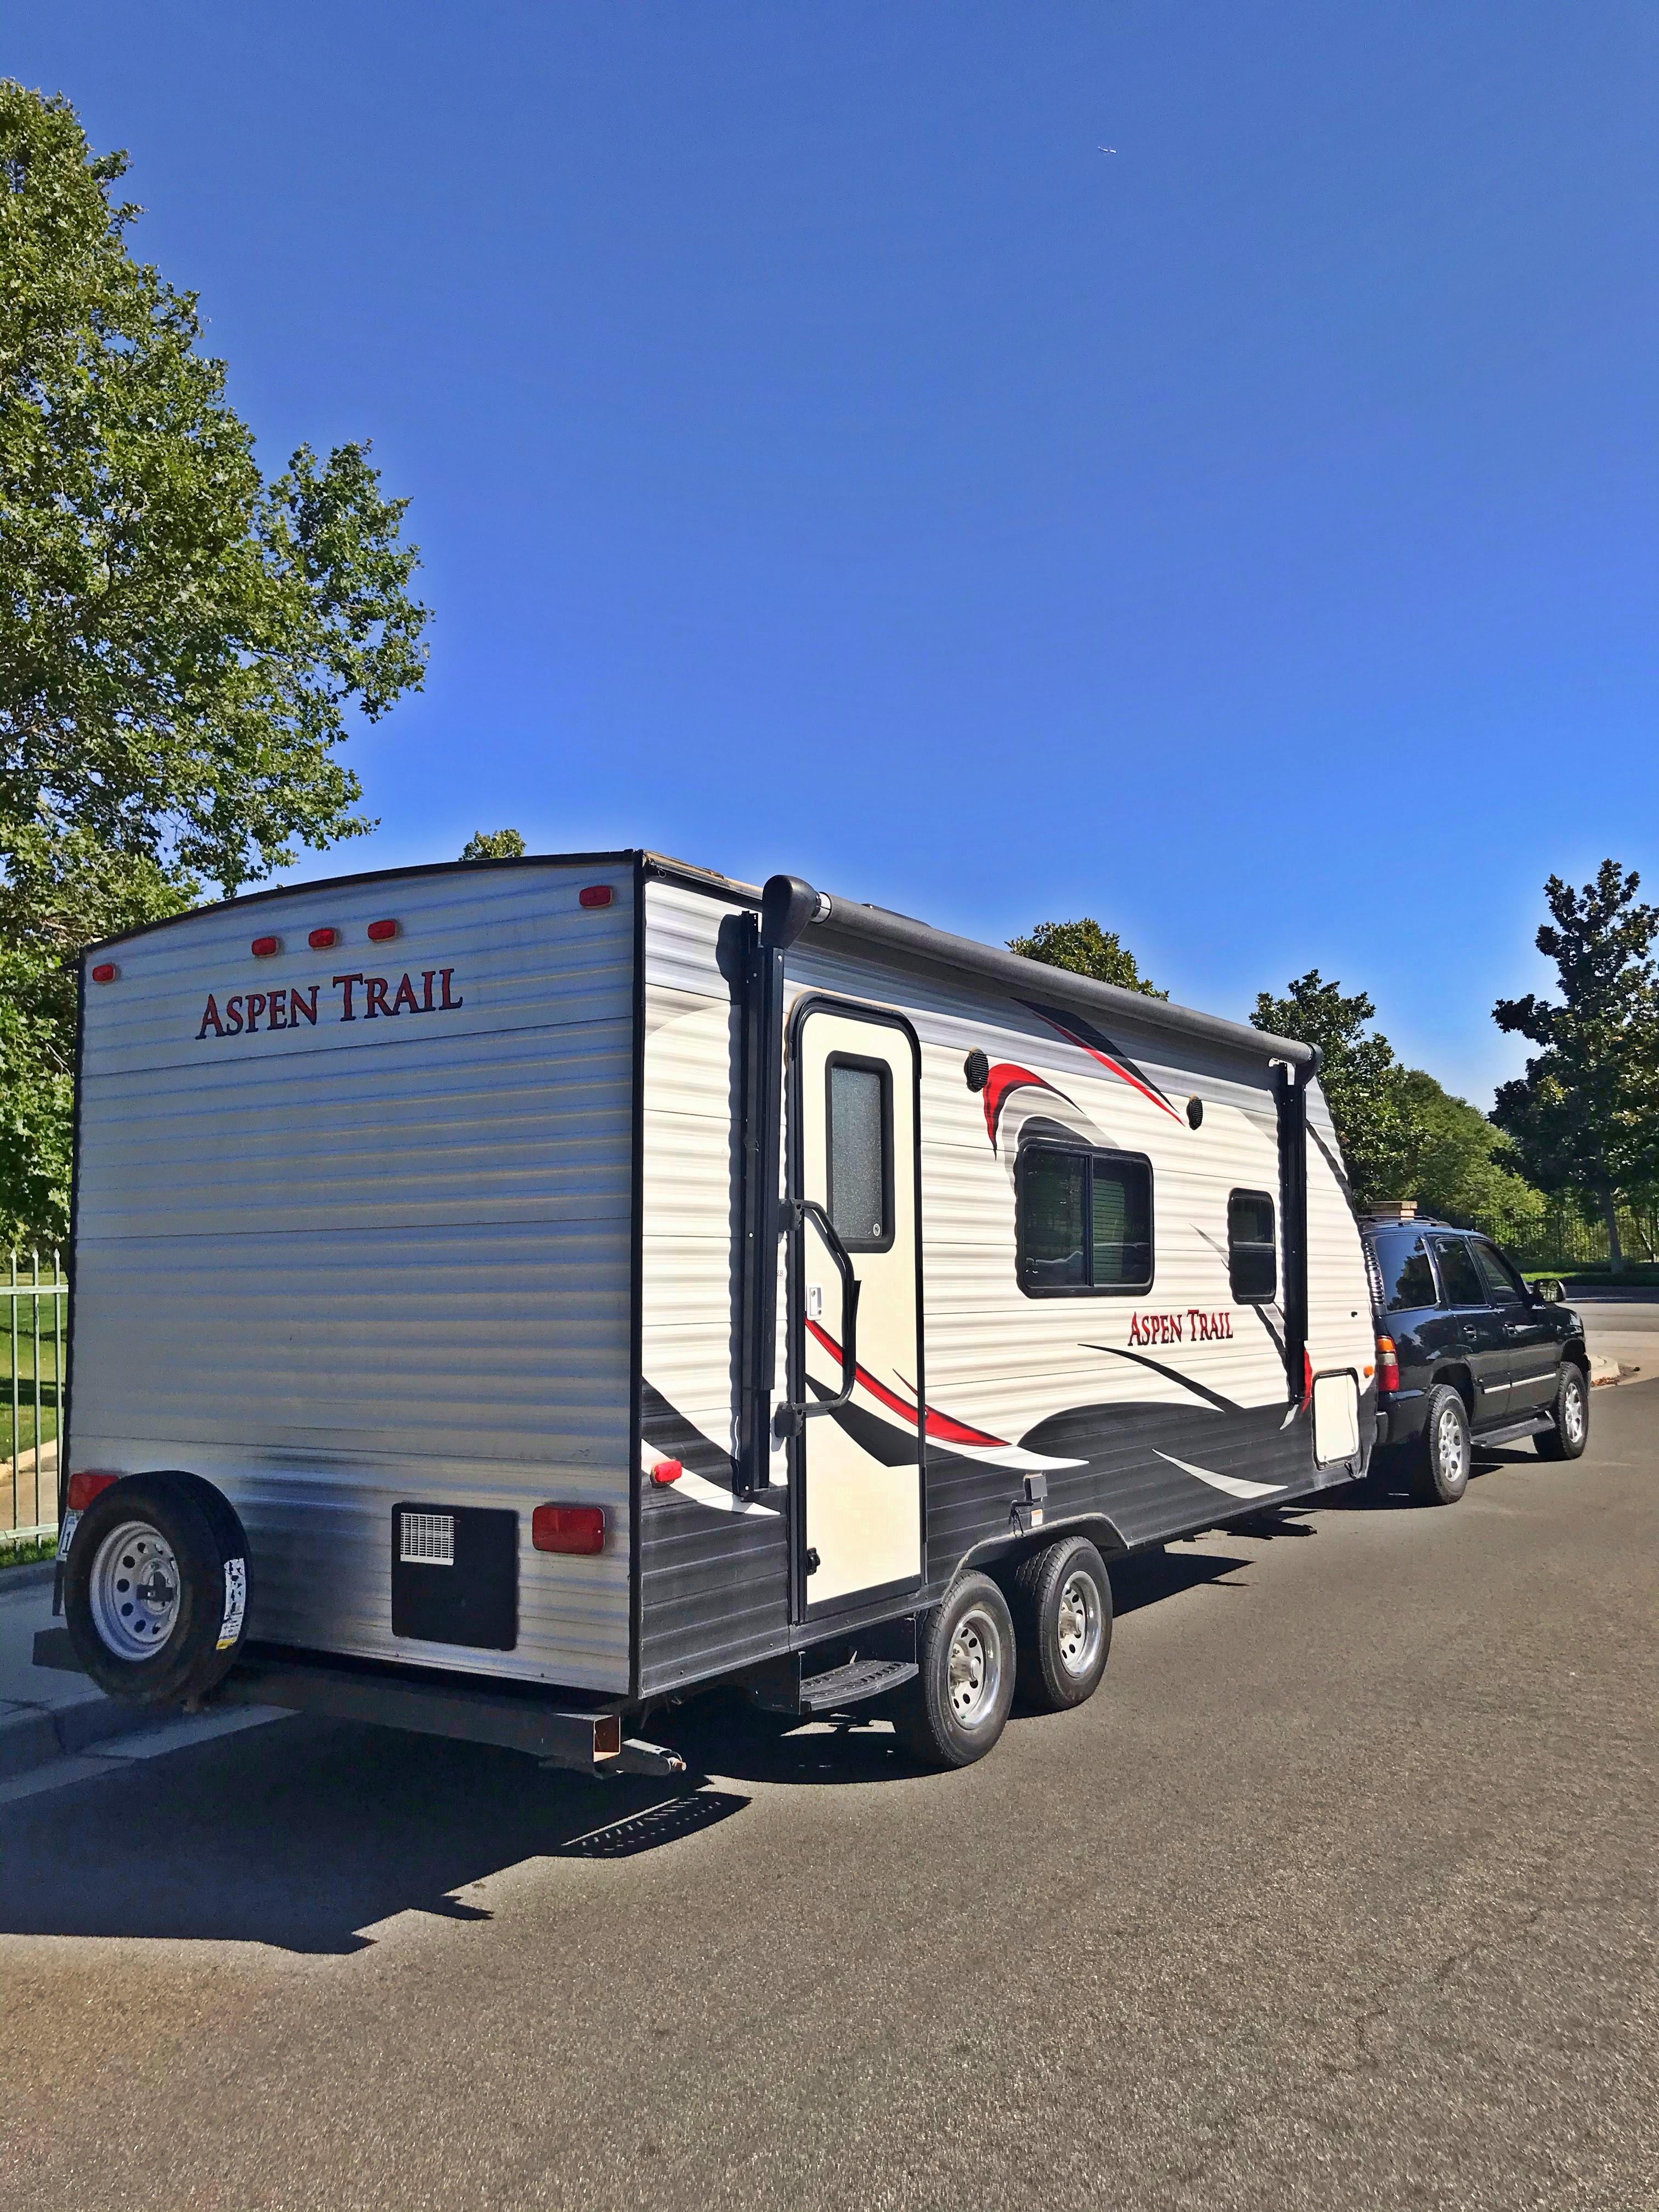 Dutchmen Travel Trailer Camper Rental Rent Near Me in Fontana California CA. Dutchmen Aspen Trail 2015